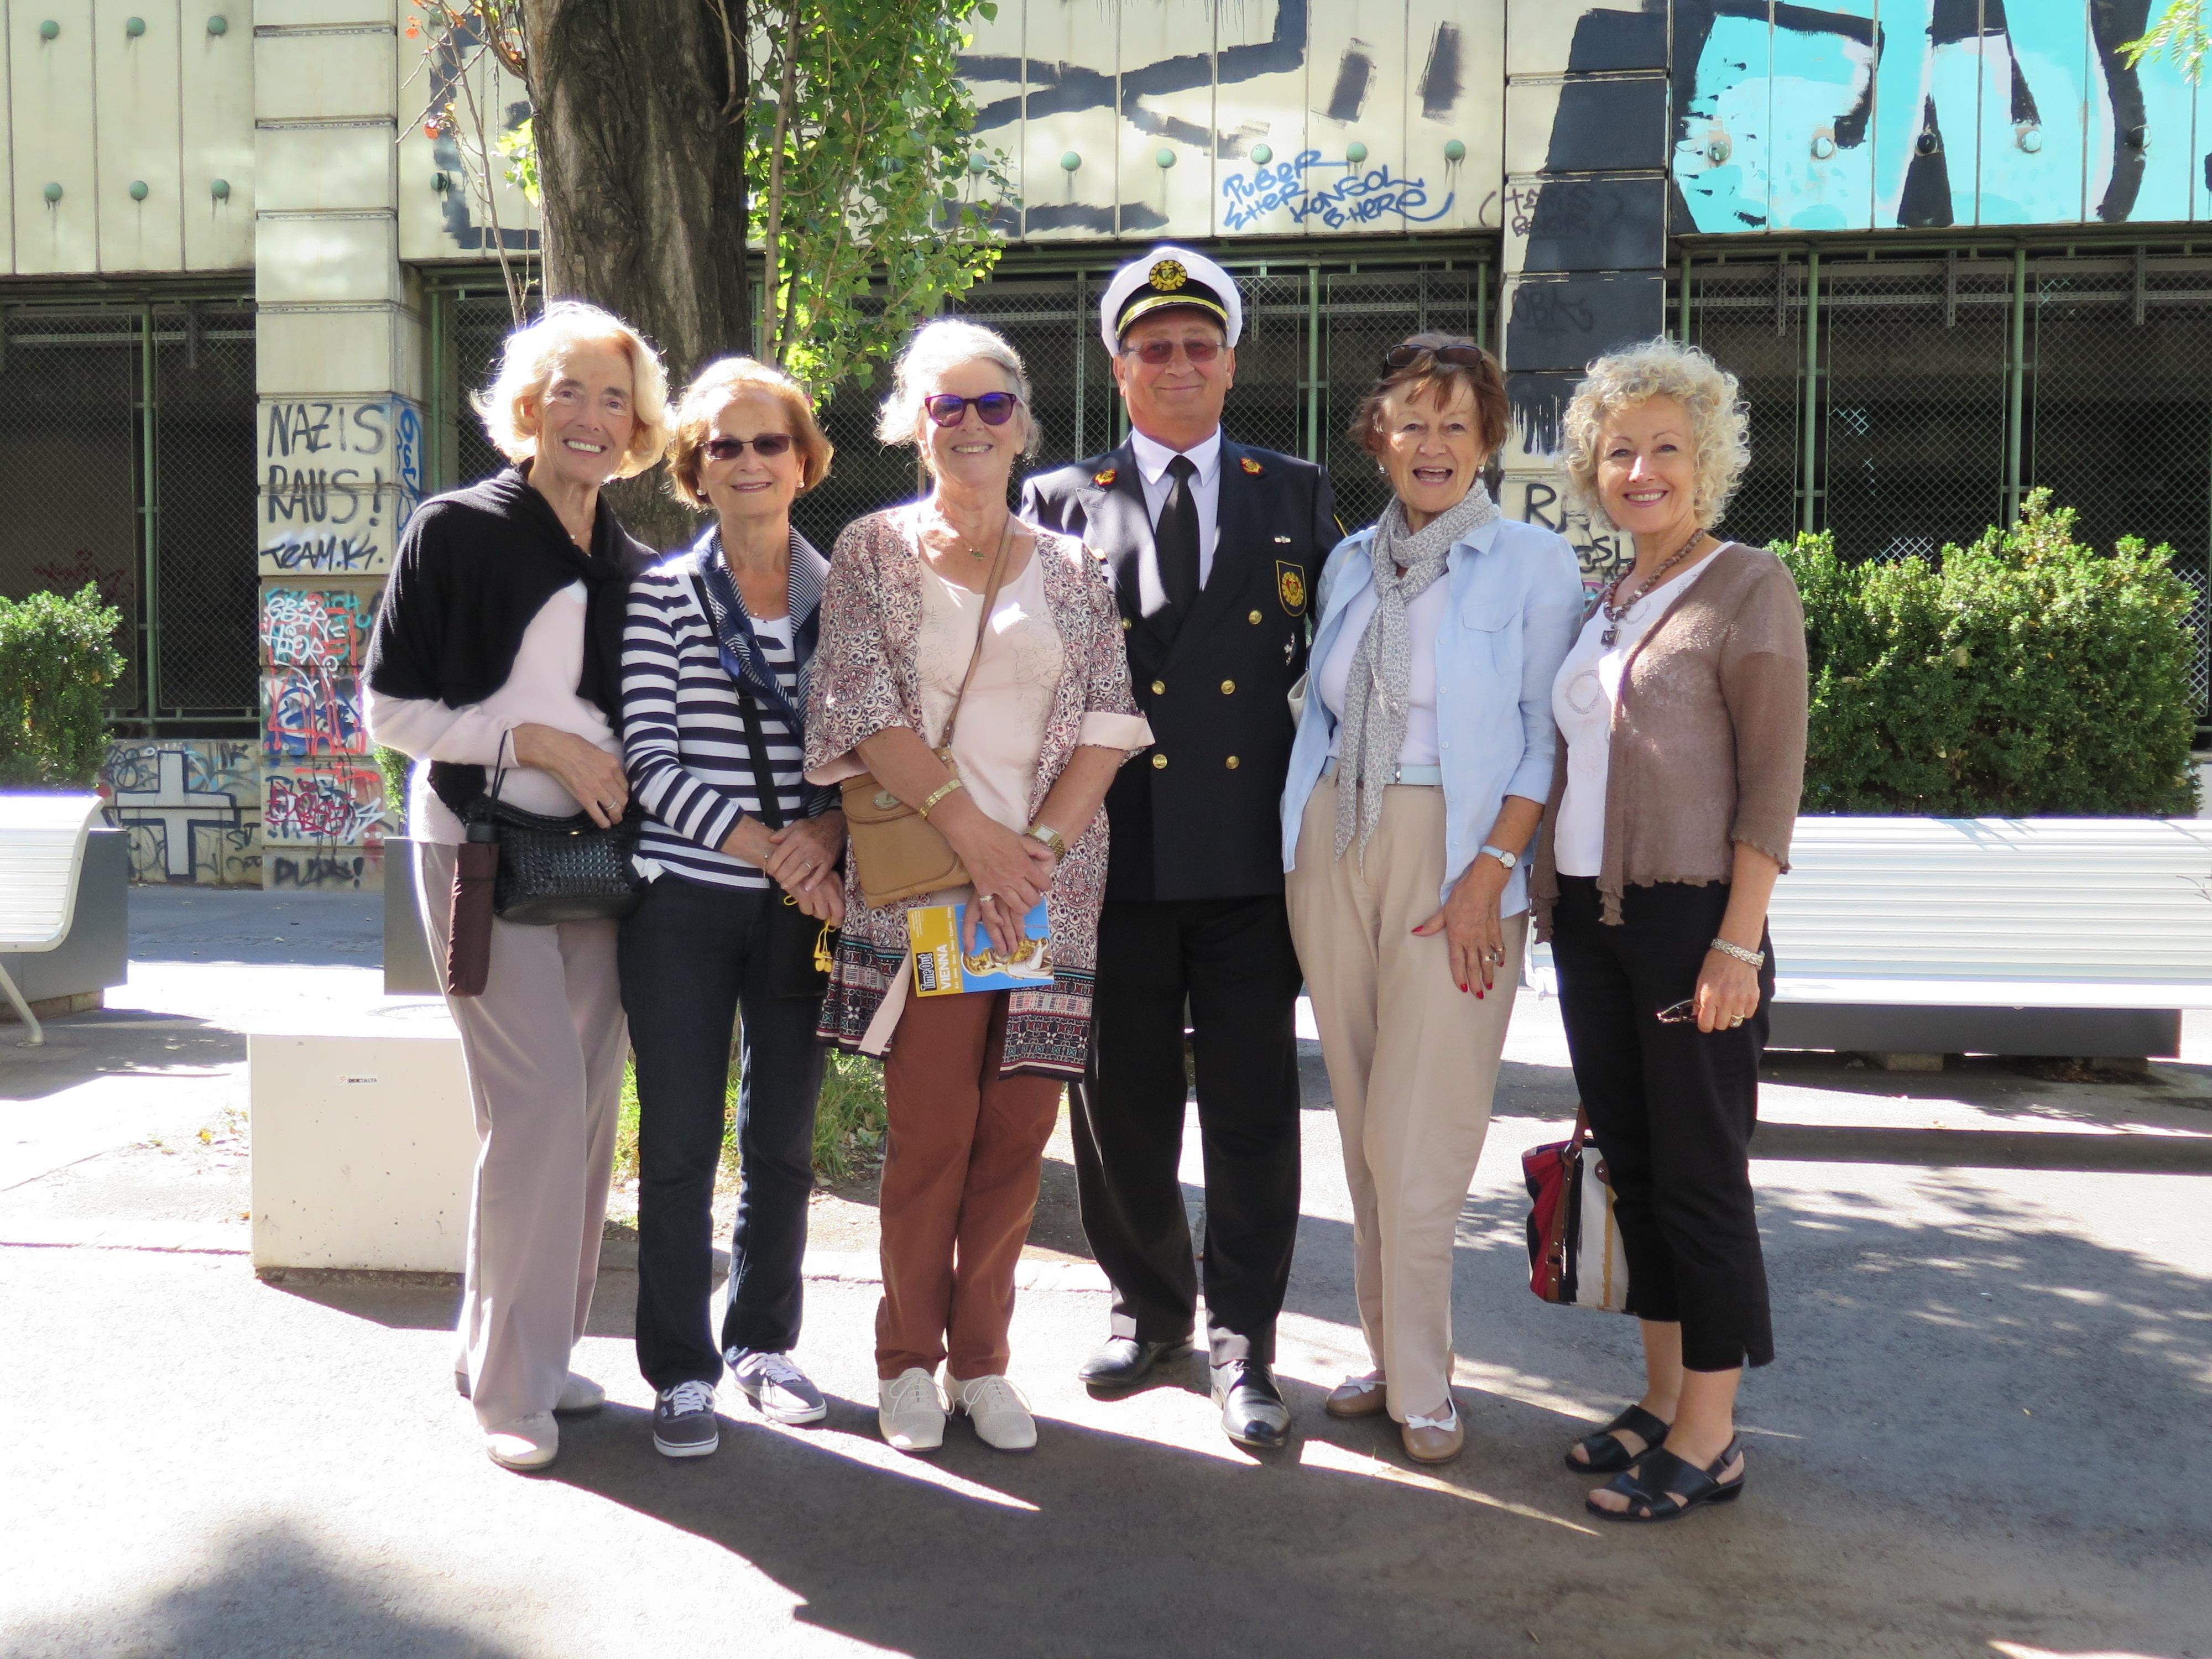 2015-09-04-VisitVienna-07